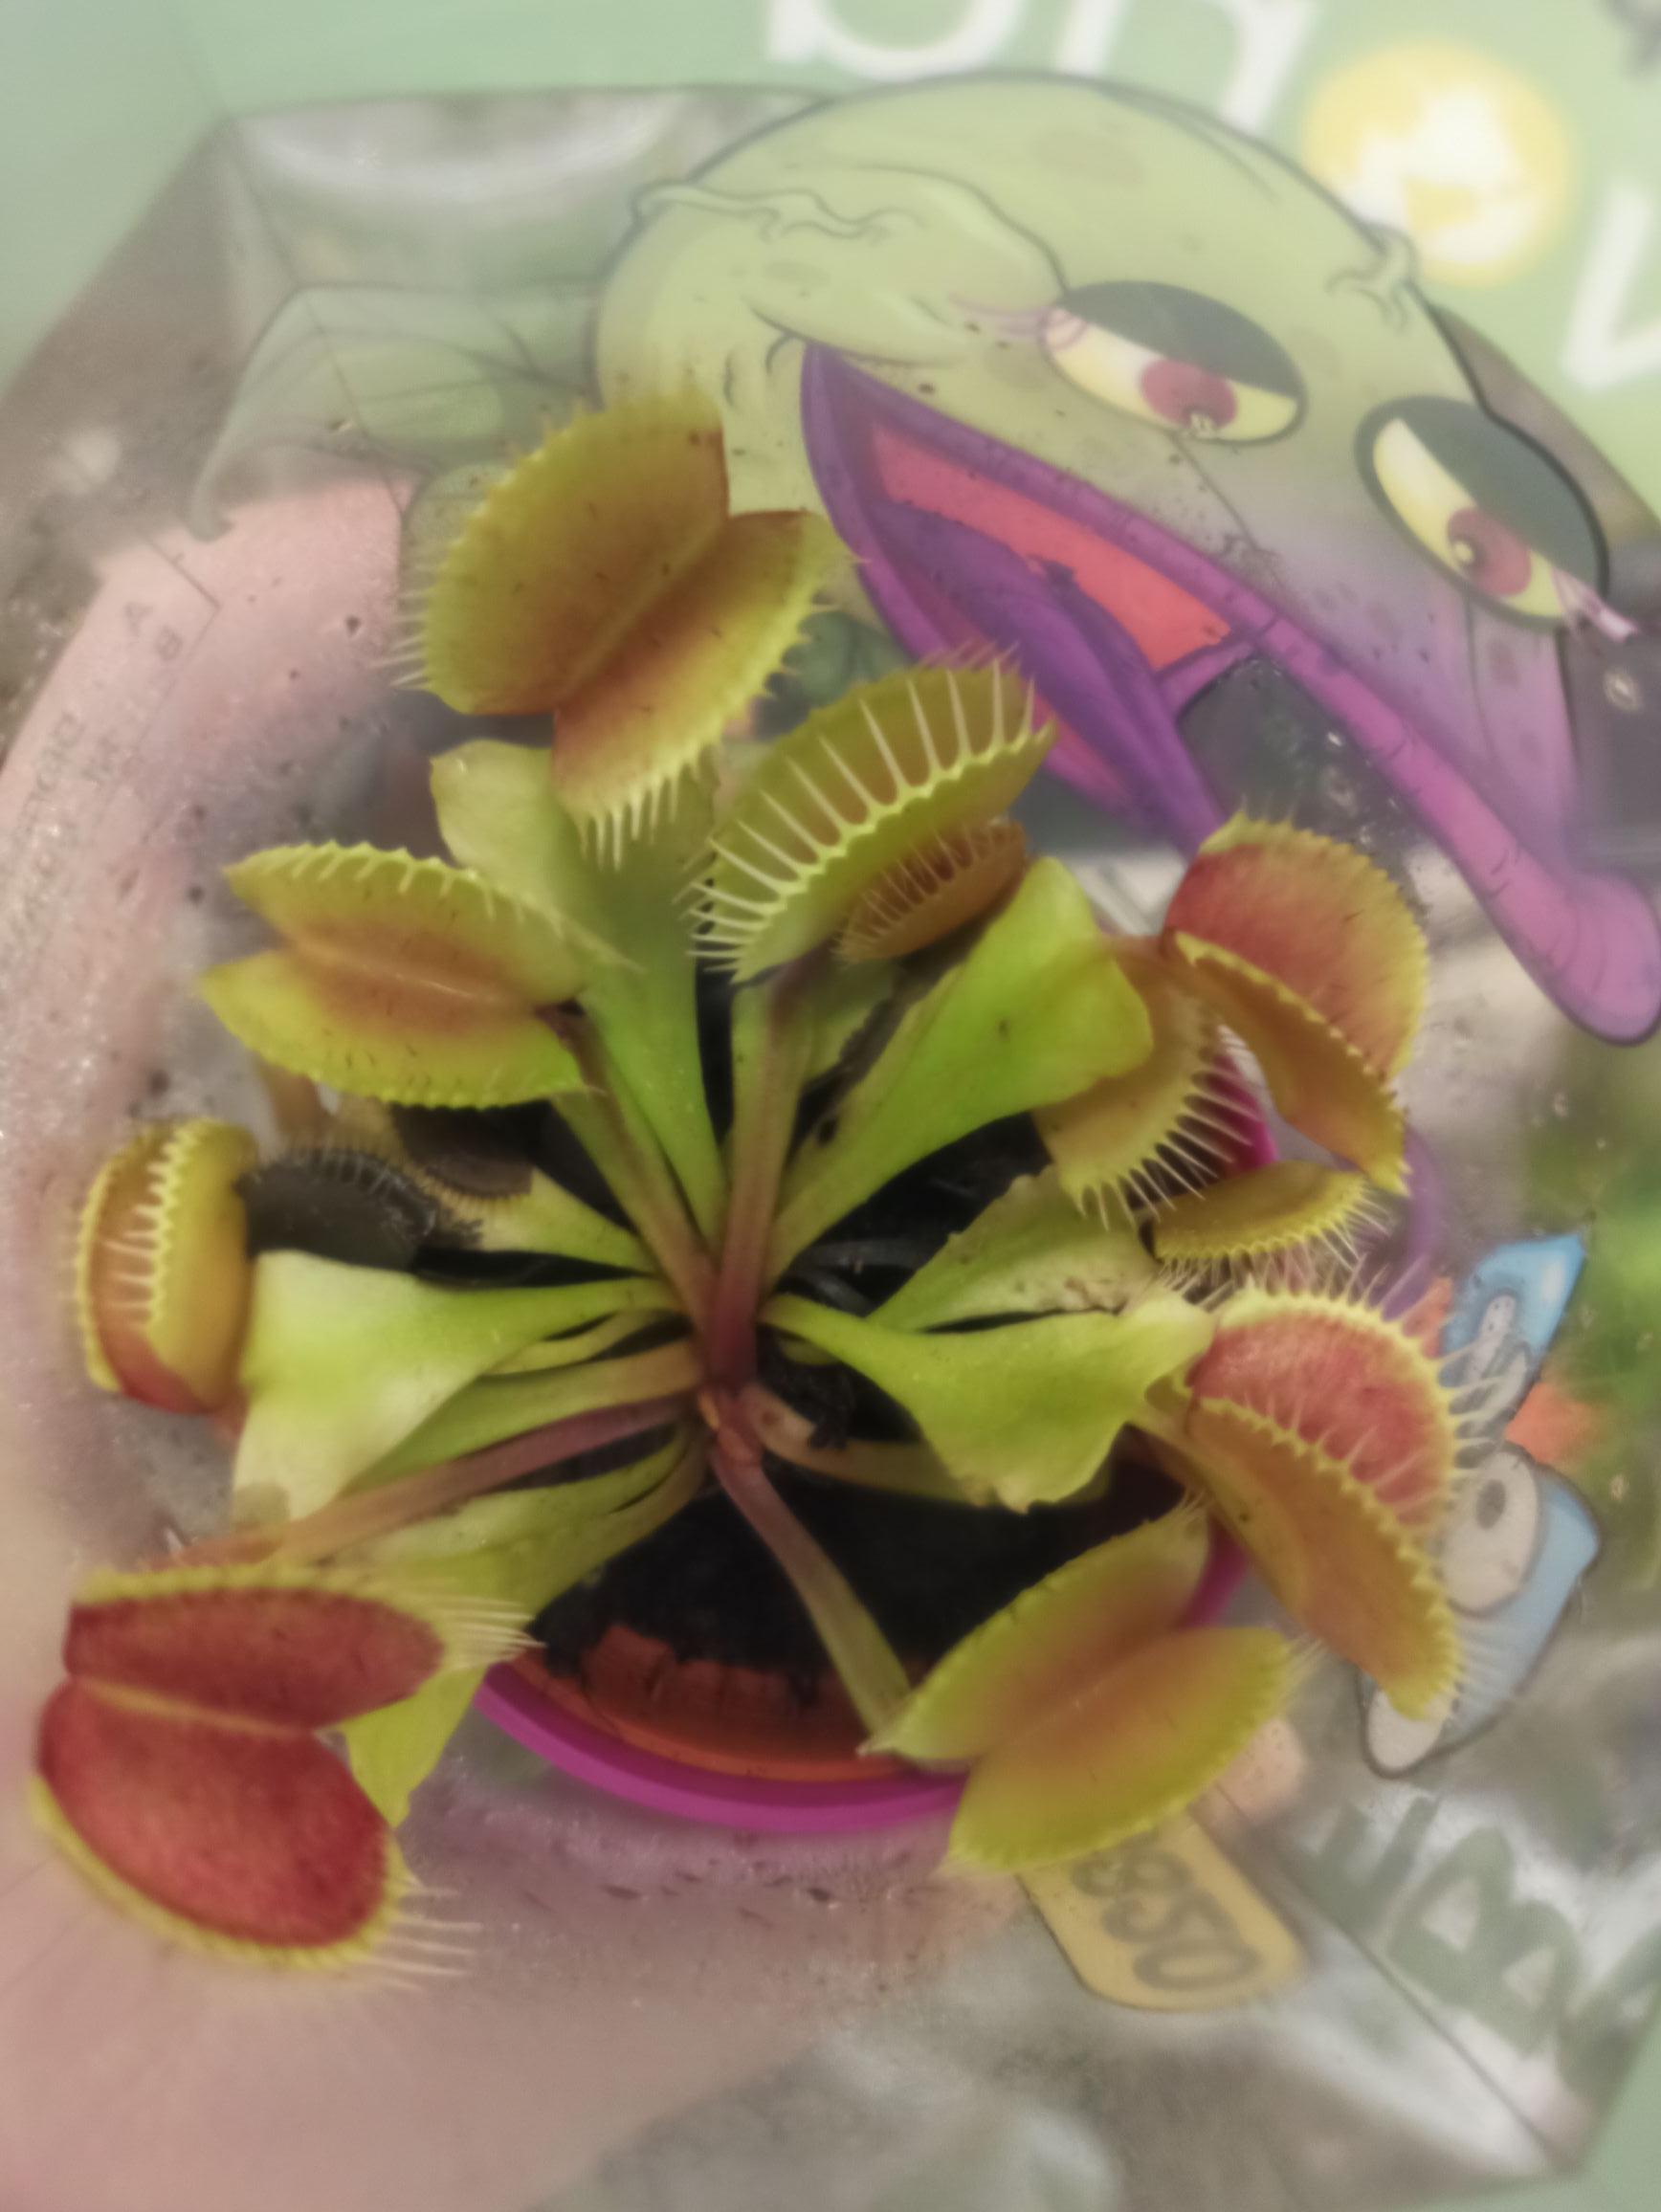 Plantas carnívoras en lidl Ortigosa